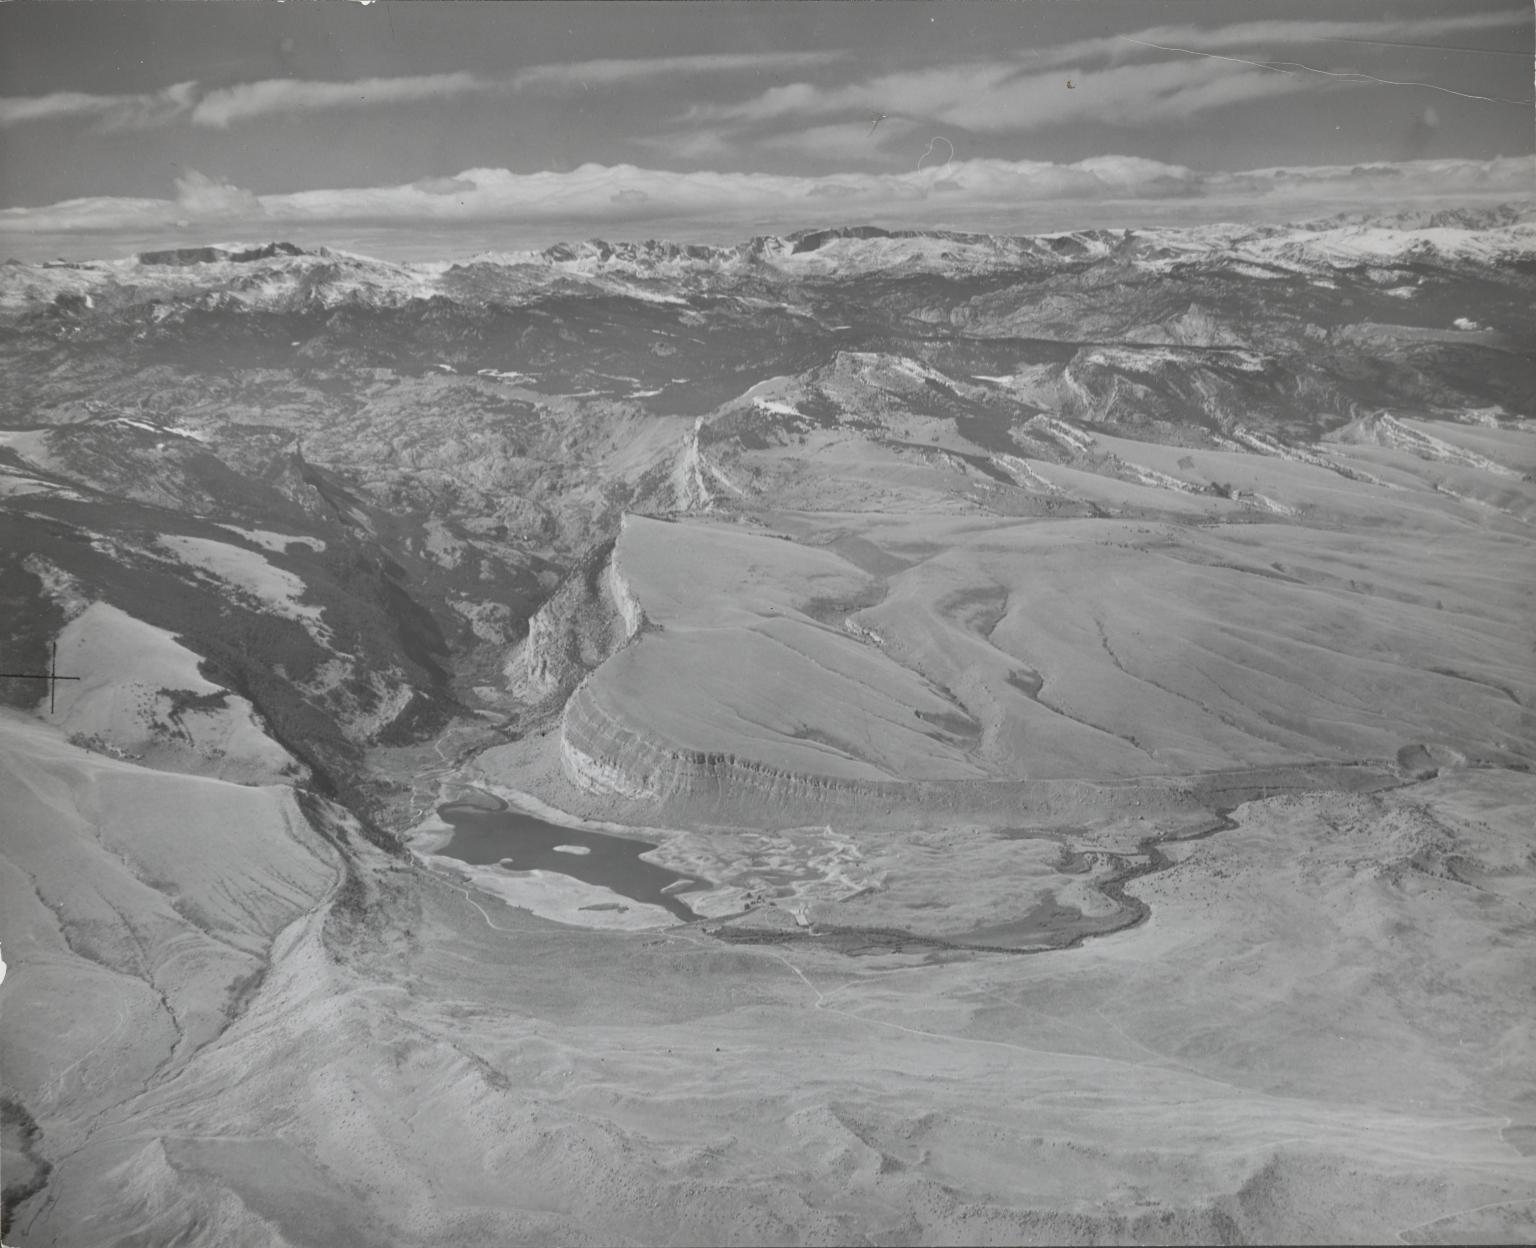 Wind River Range, Wyoming